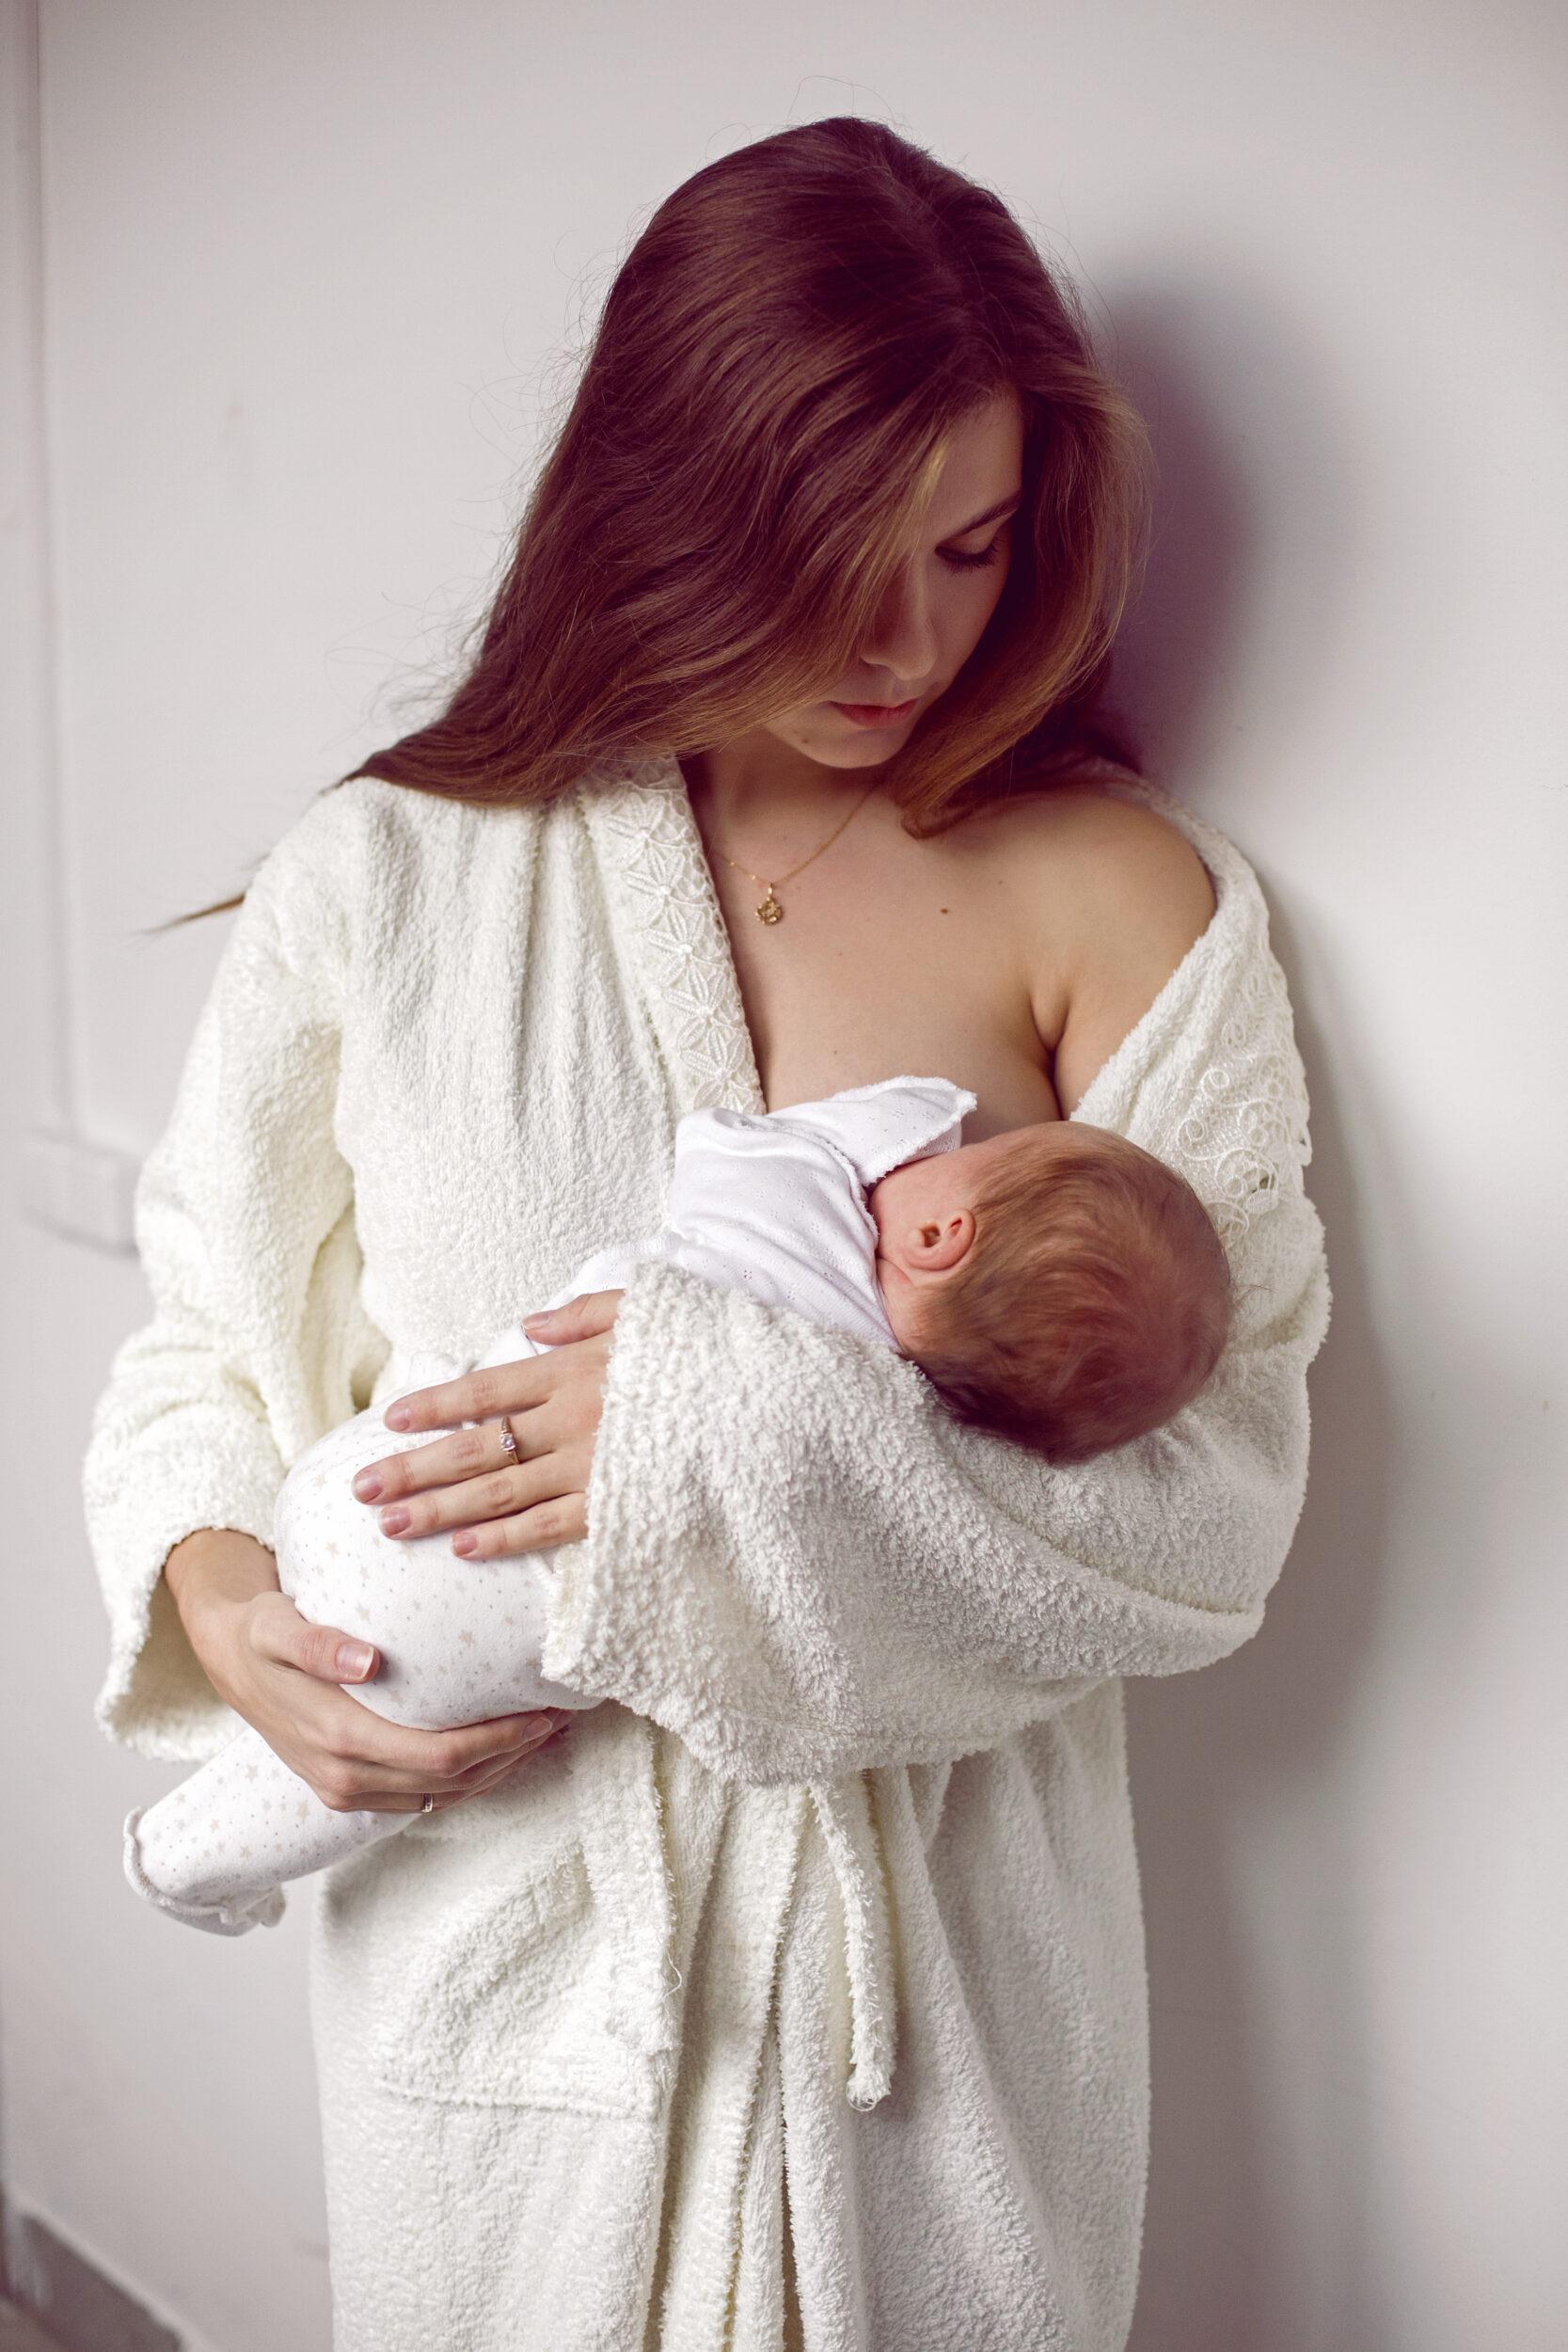 Mother in cozy white robe breastfeeding infant